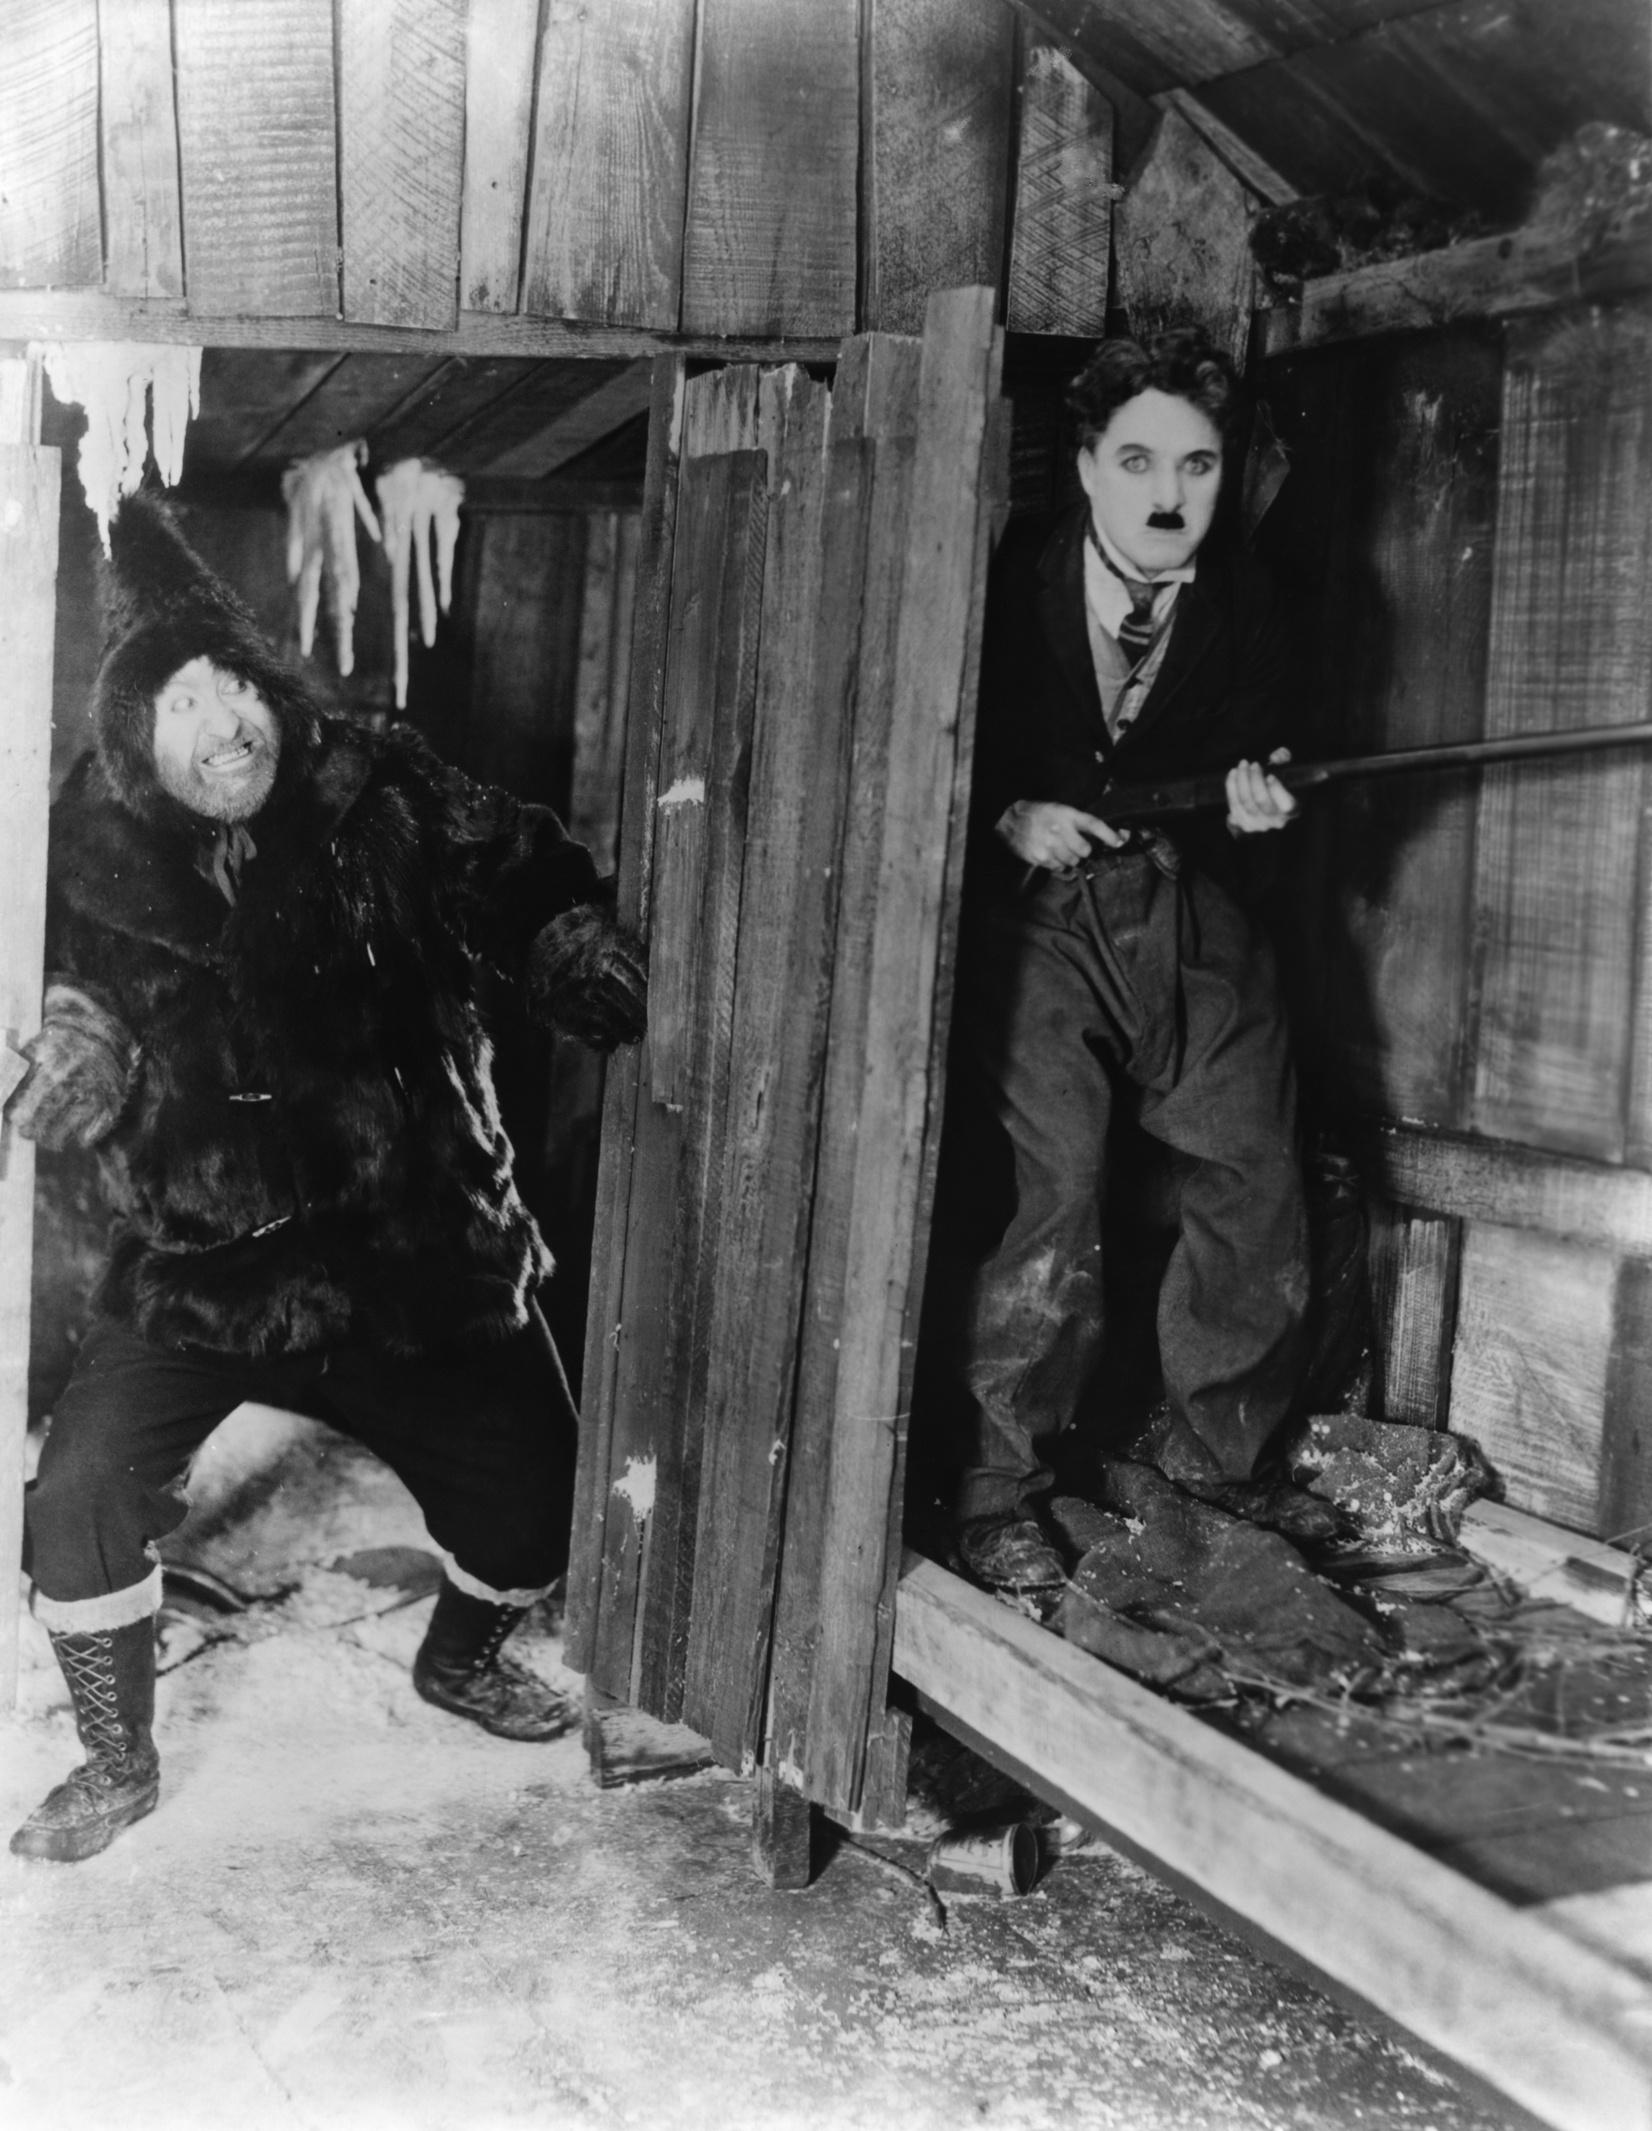 Charlie Chaplin with Mack Swain (R)